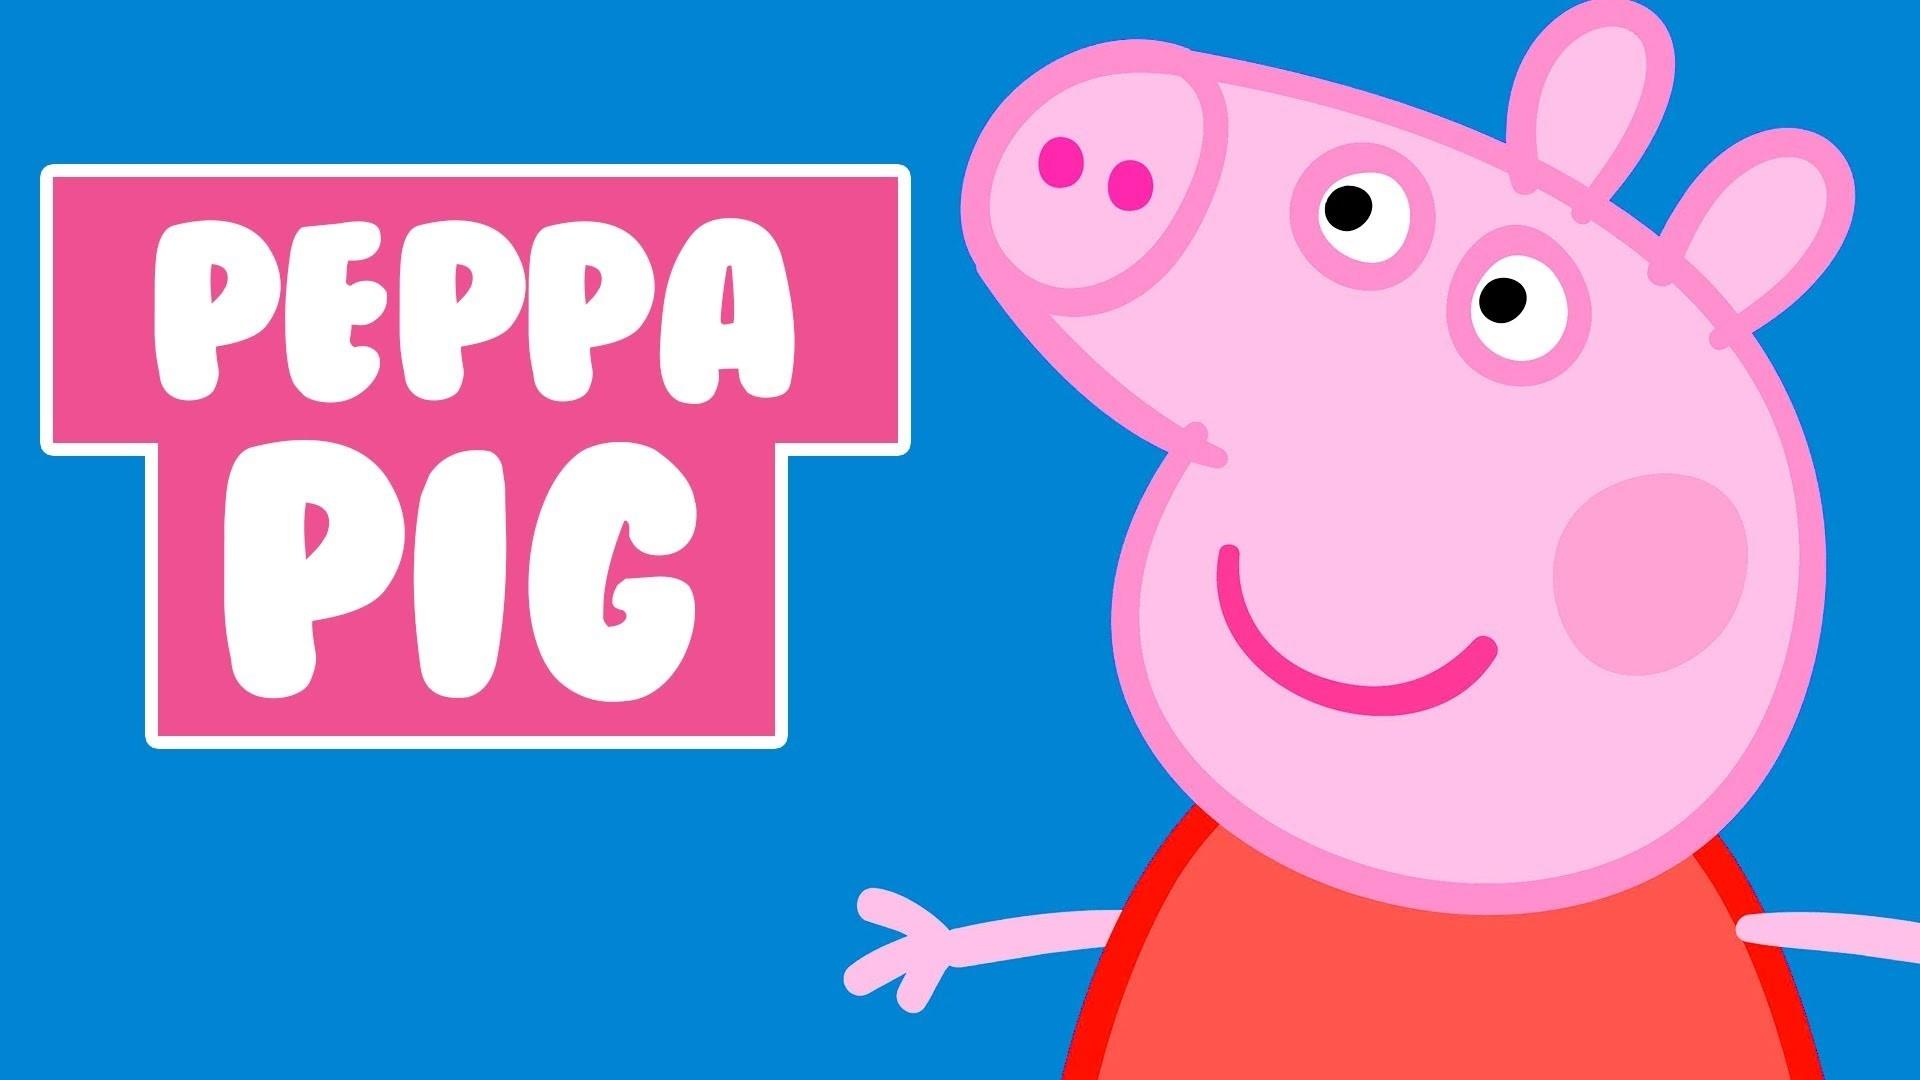 Peppa Pig Wallpapers Wallpapertag